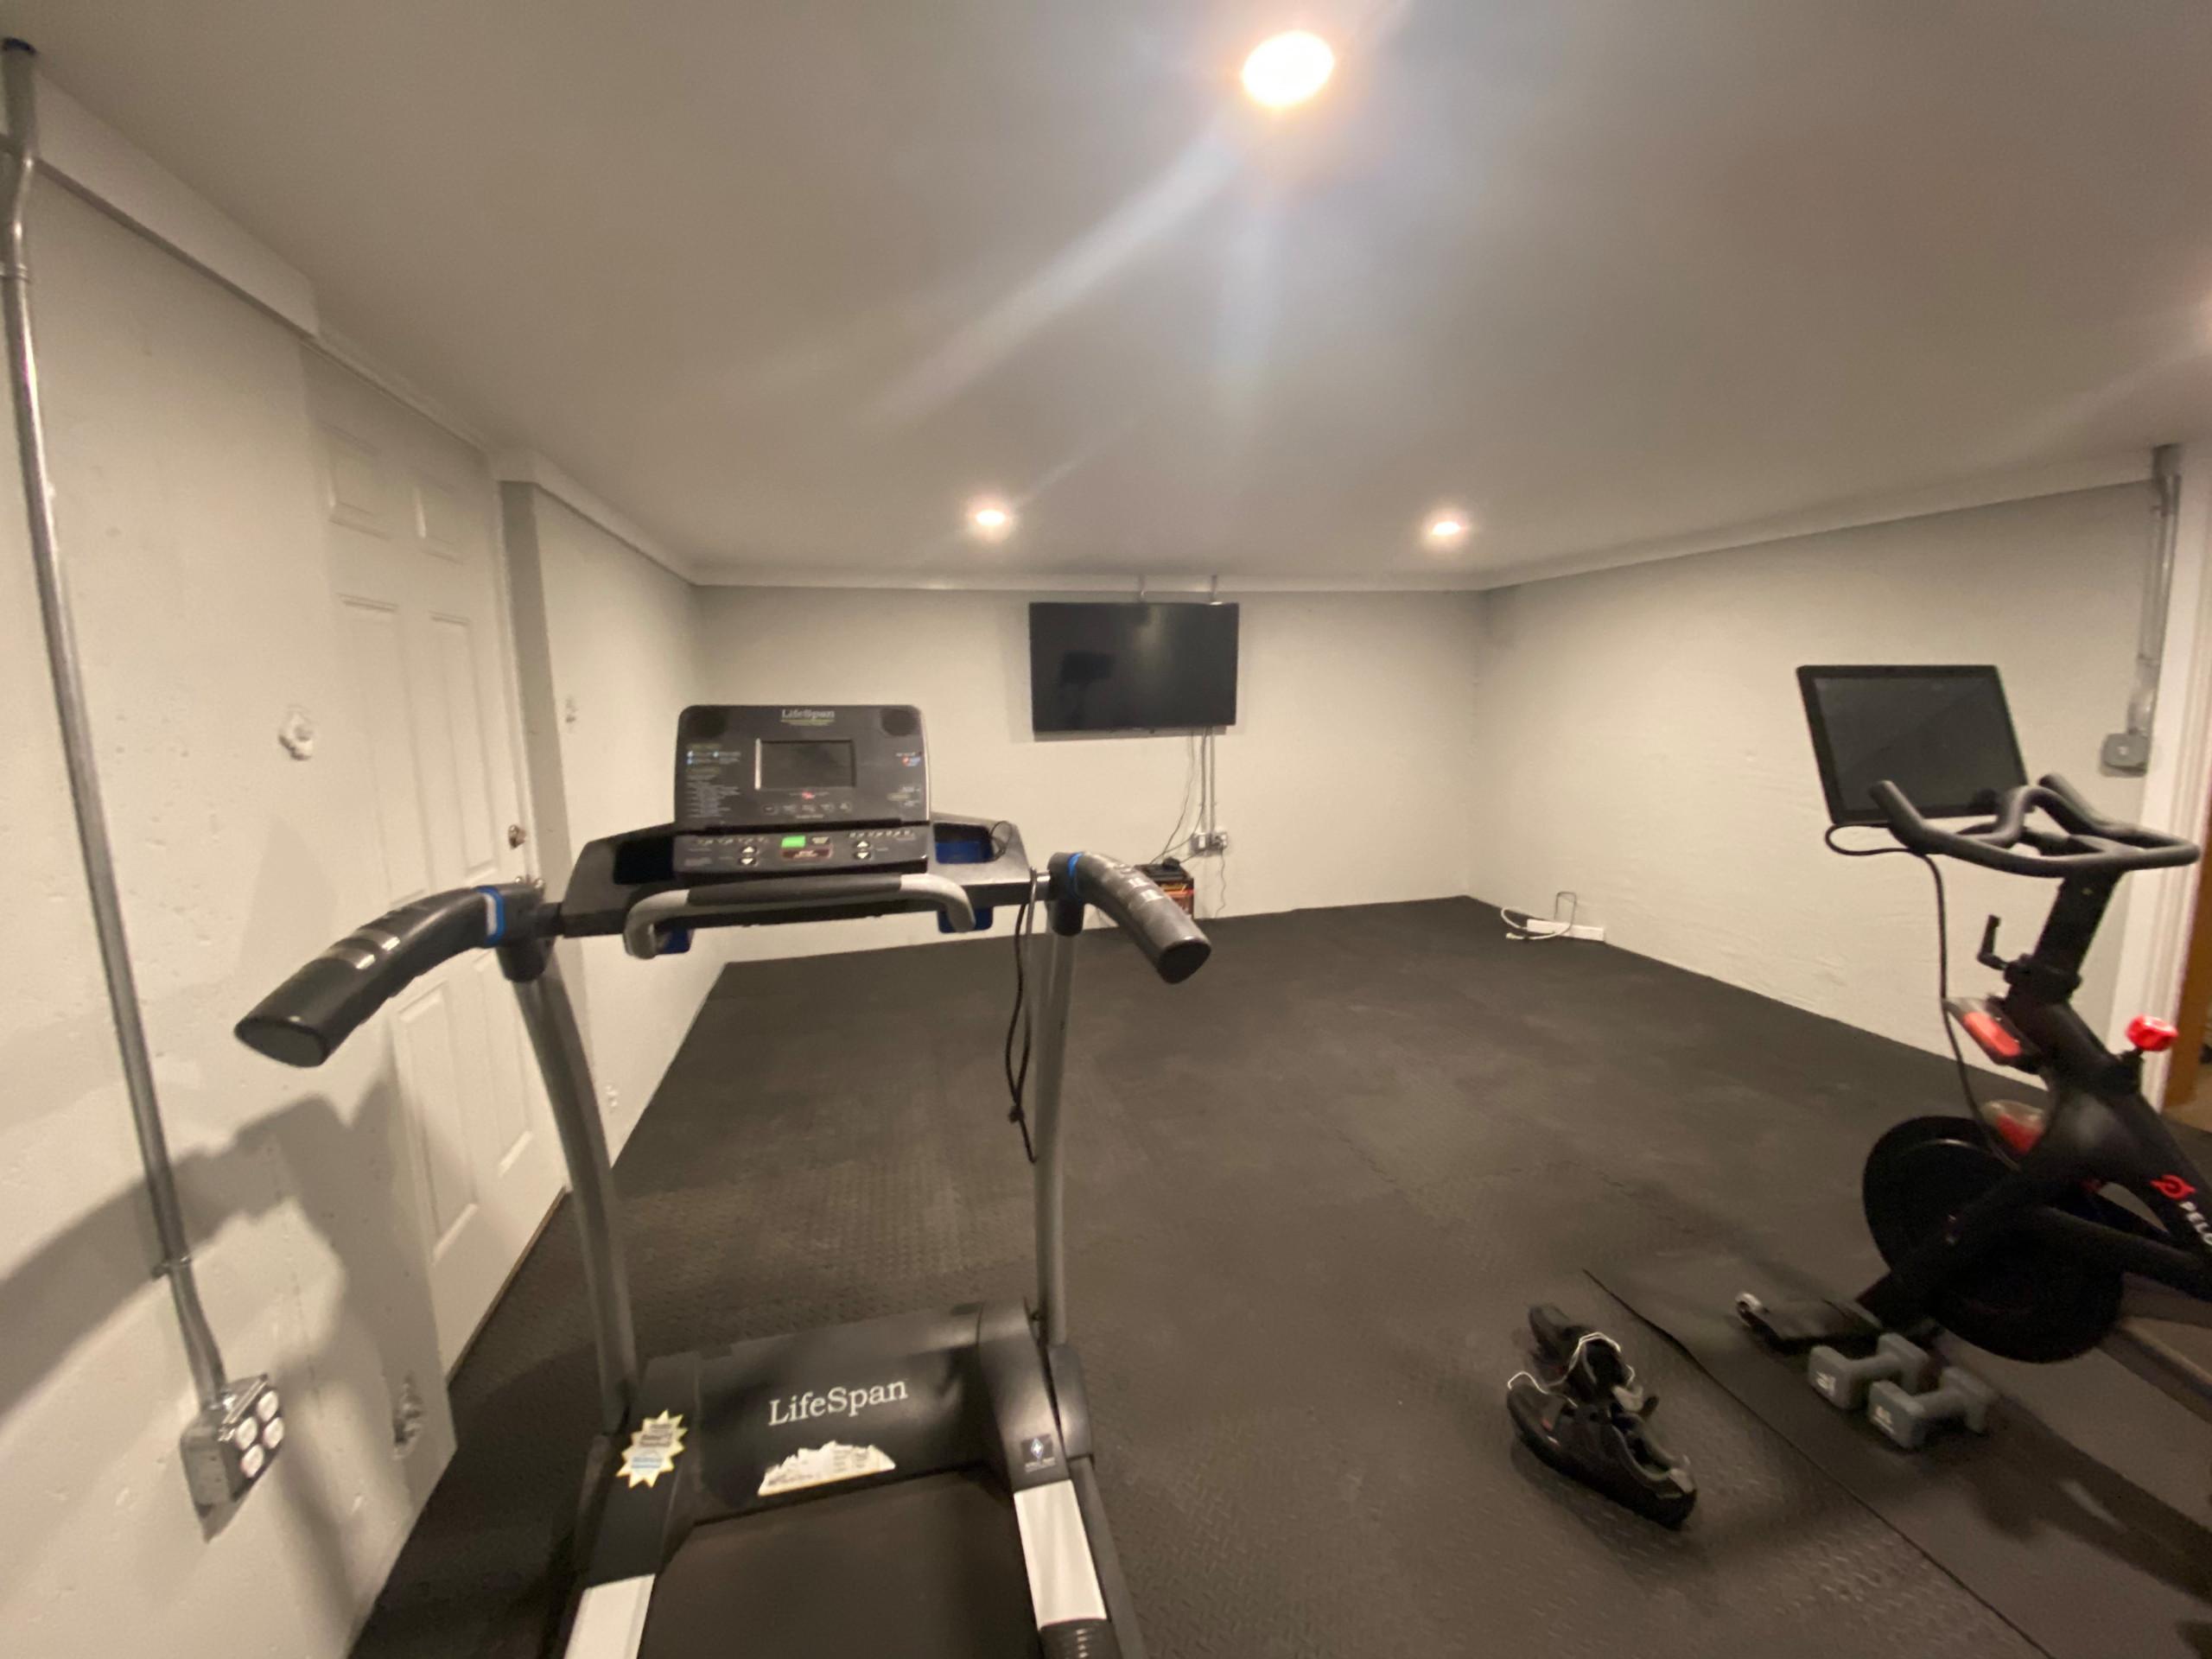 Fitness / Exercise Room Design